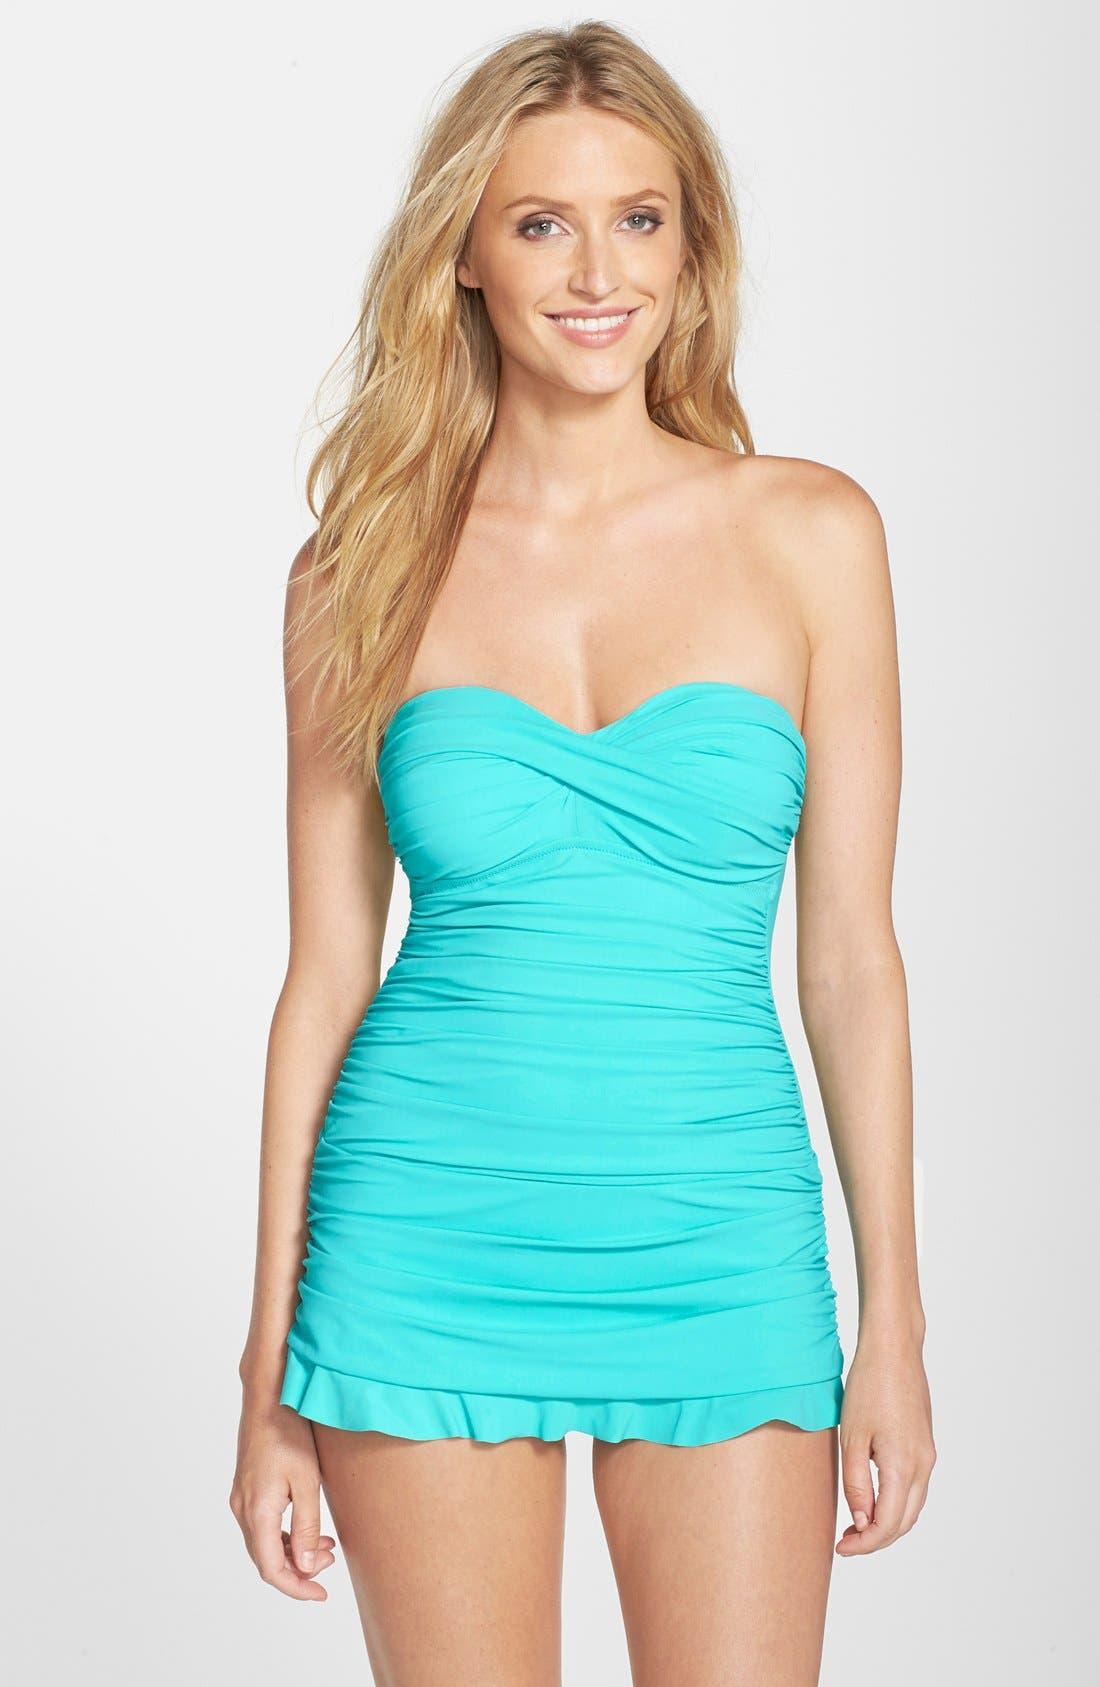 Alternate Image 1 Selected - Profile by Gottex 'Tutti Frutti' Swim Dress